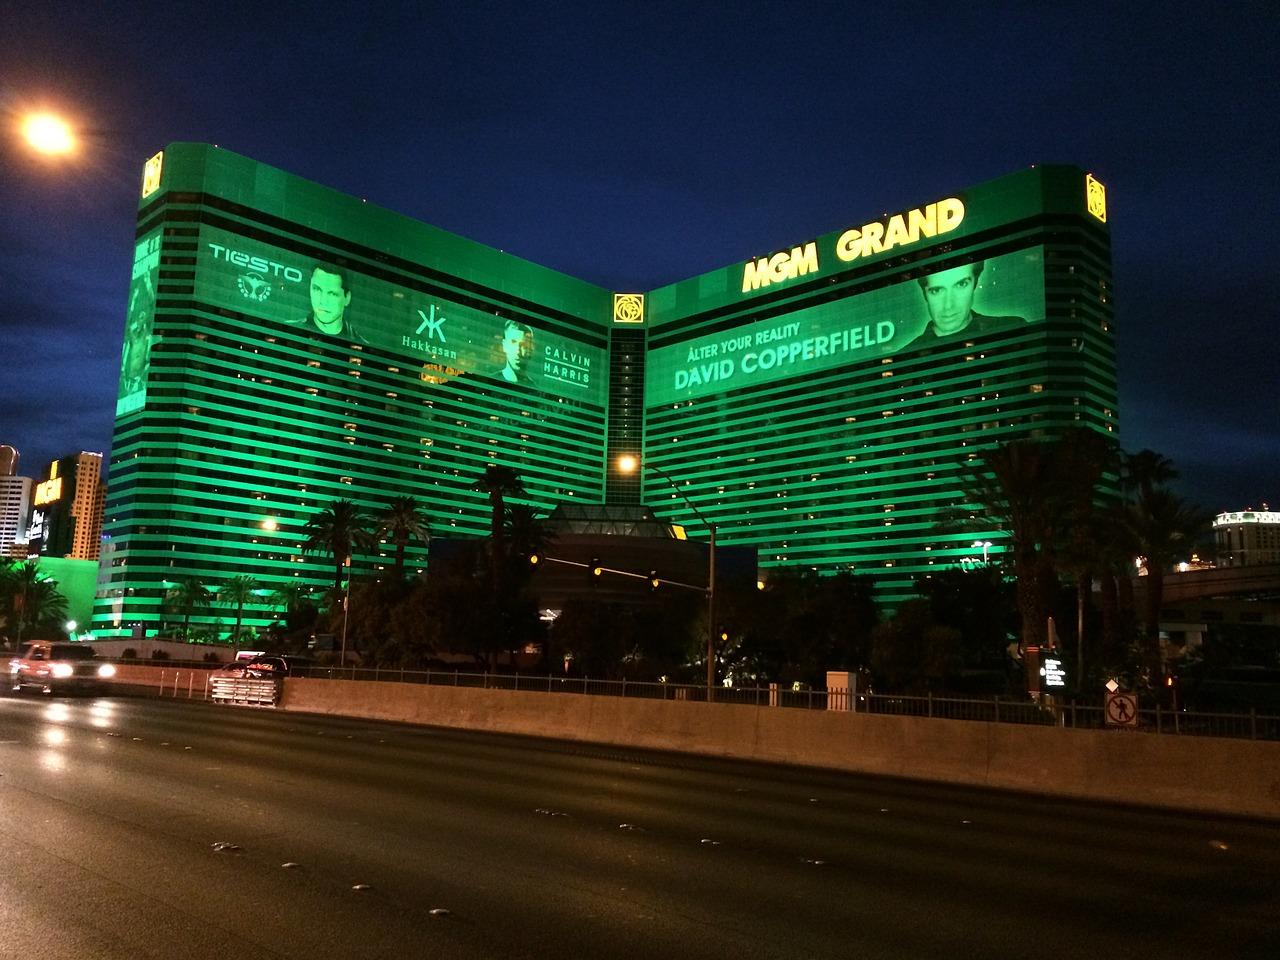 MGM Grand Vegas Hotel